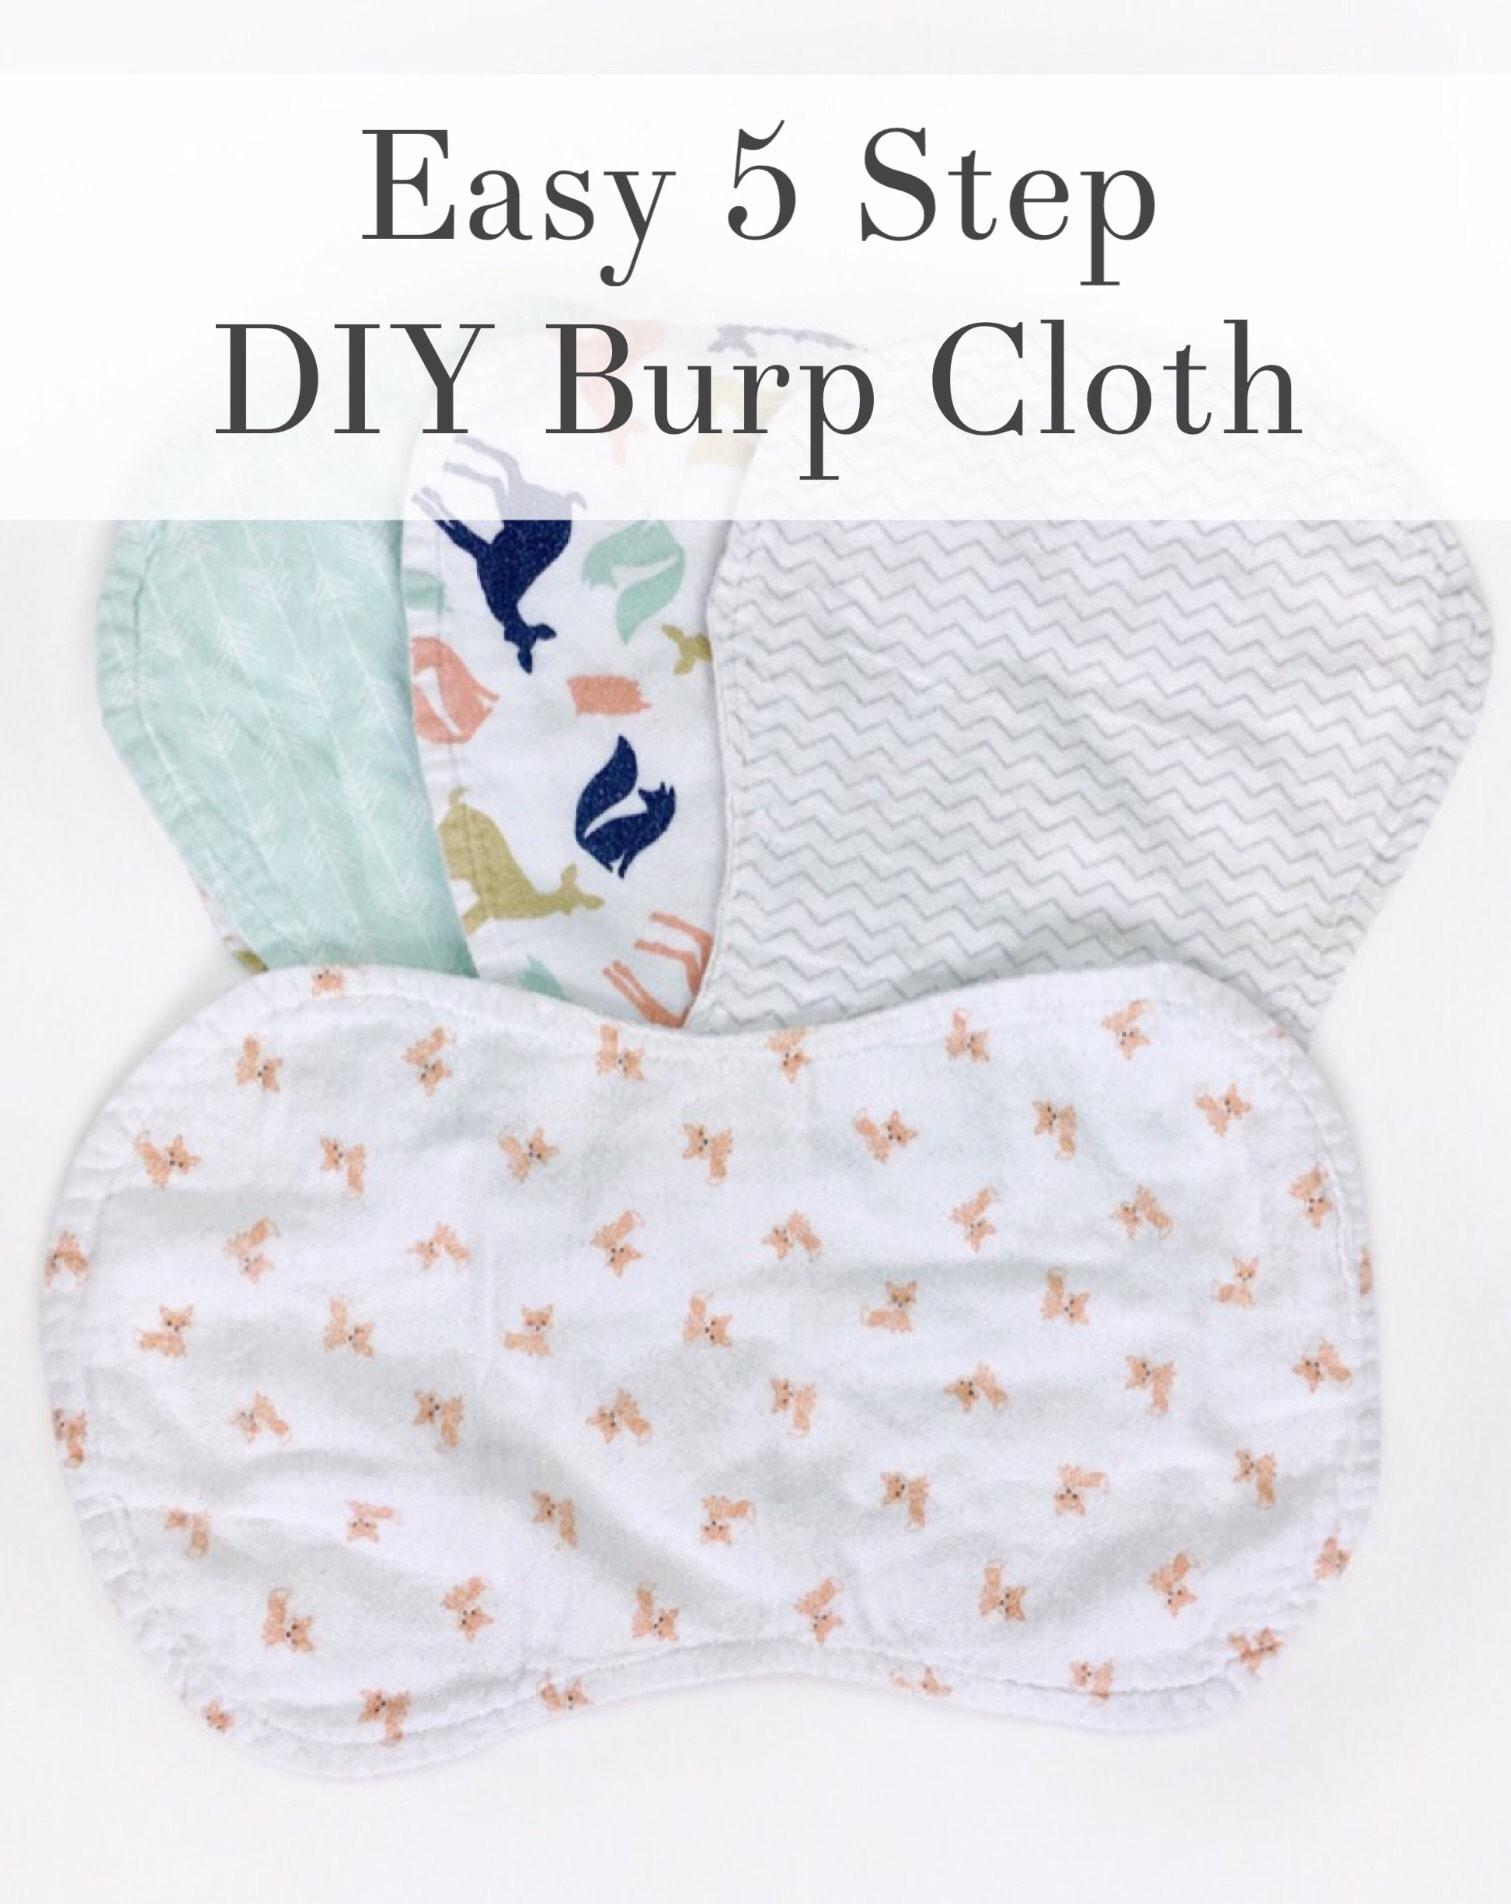 Easy 5 Step Diy Burp Cloth Burp Rag Life On Waller